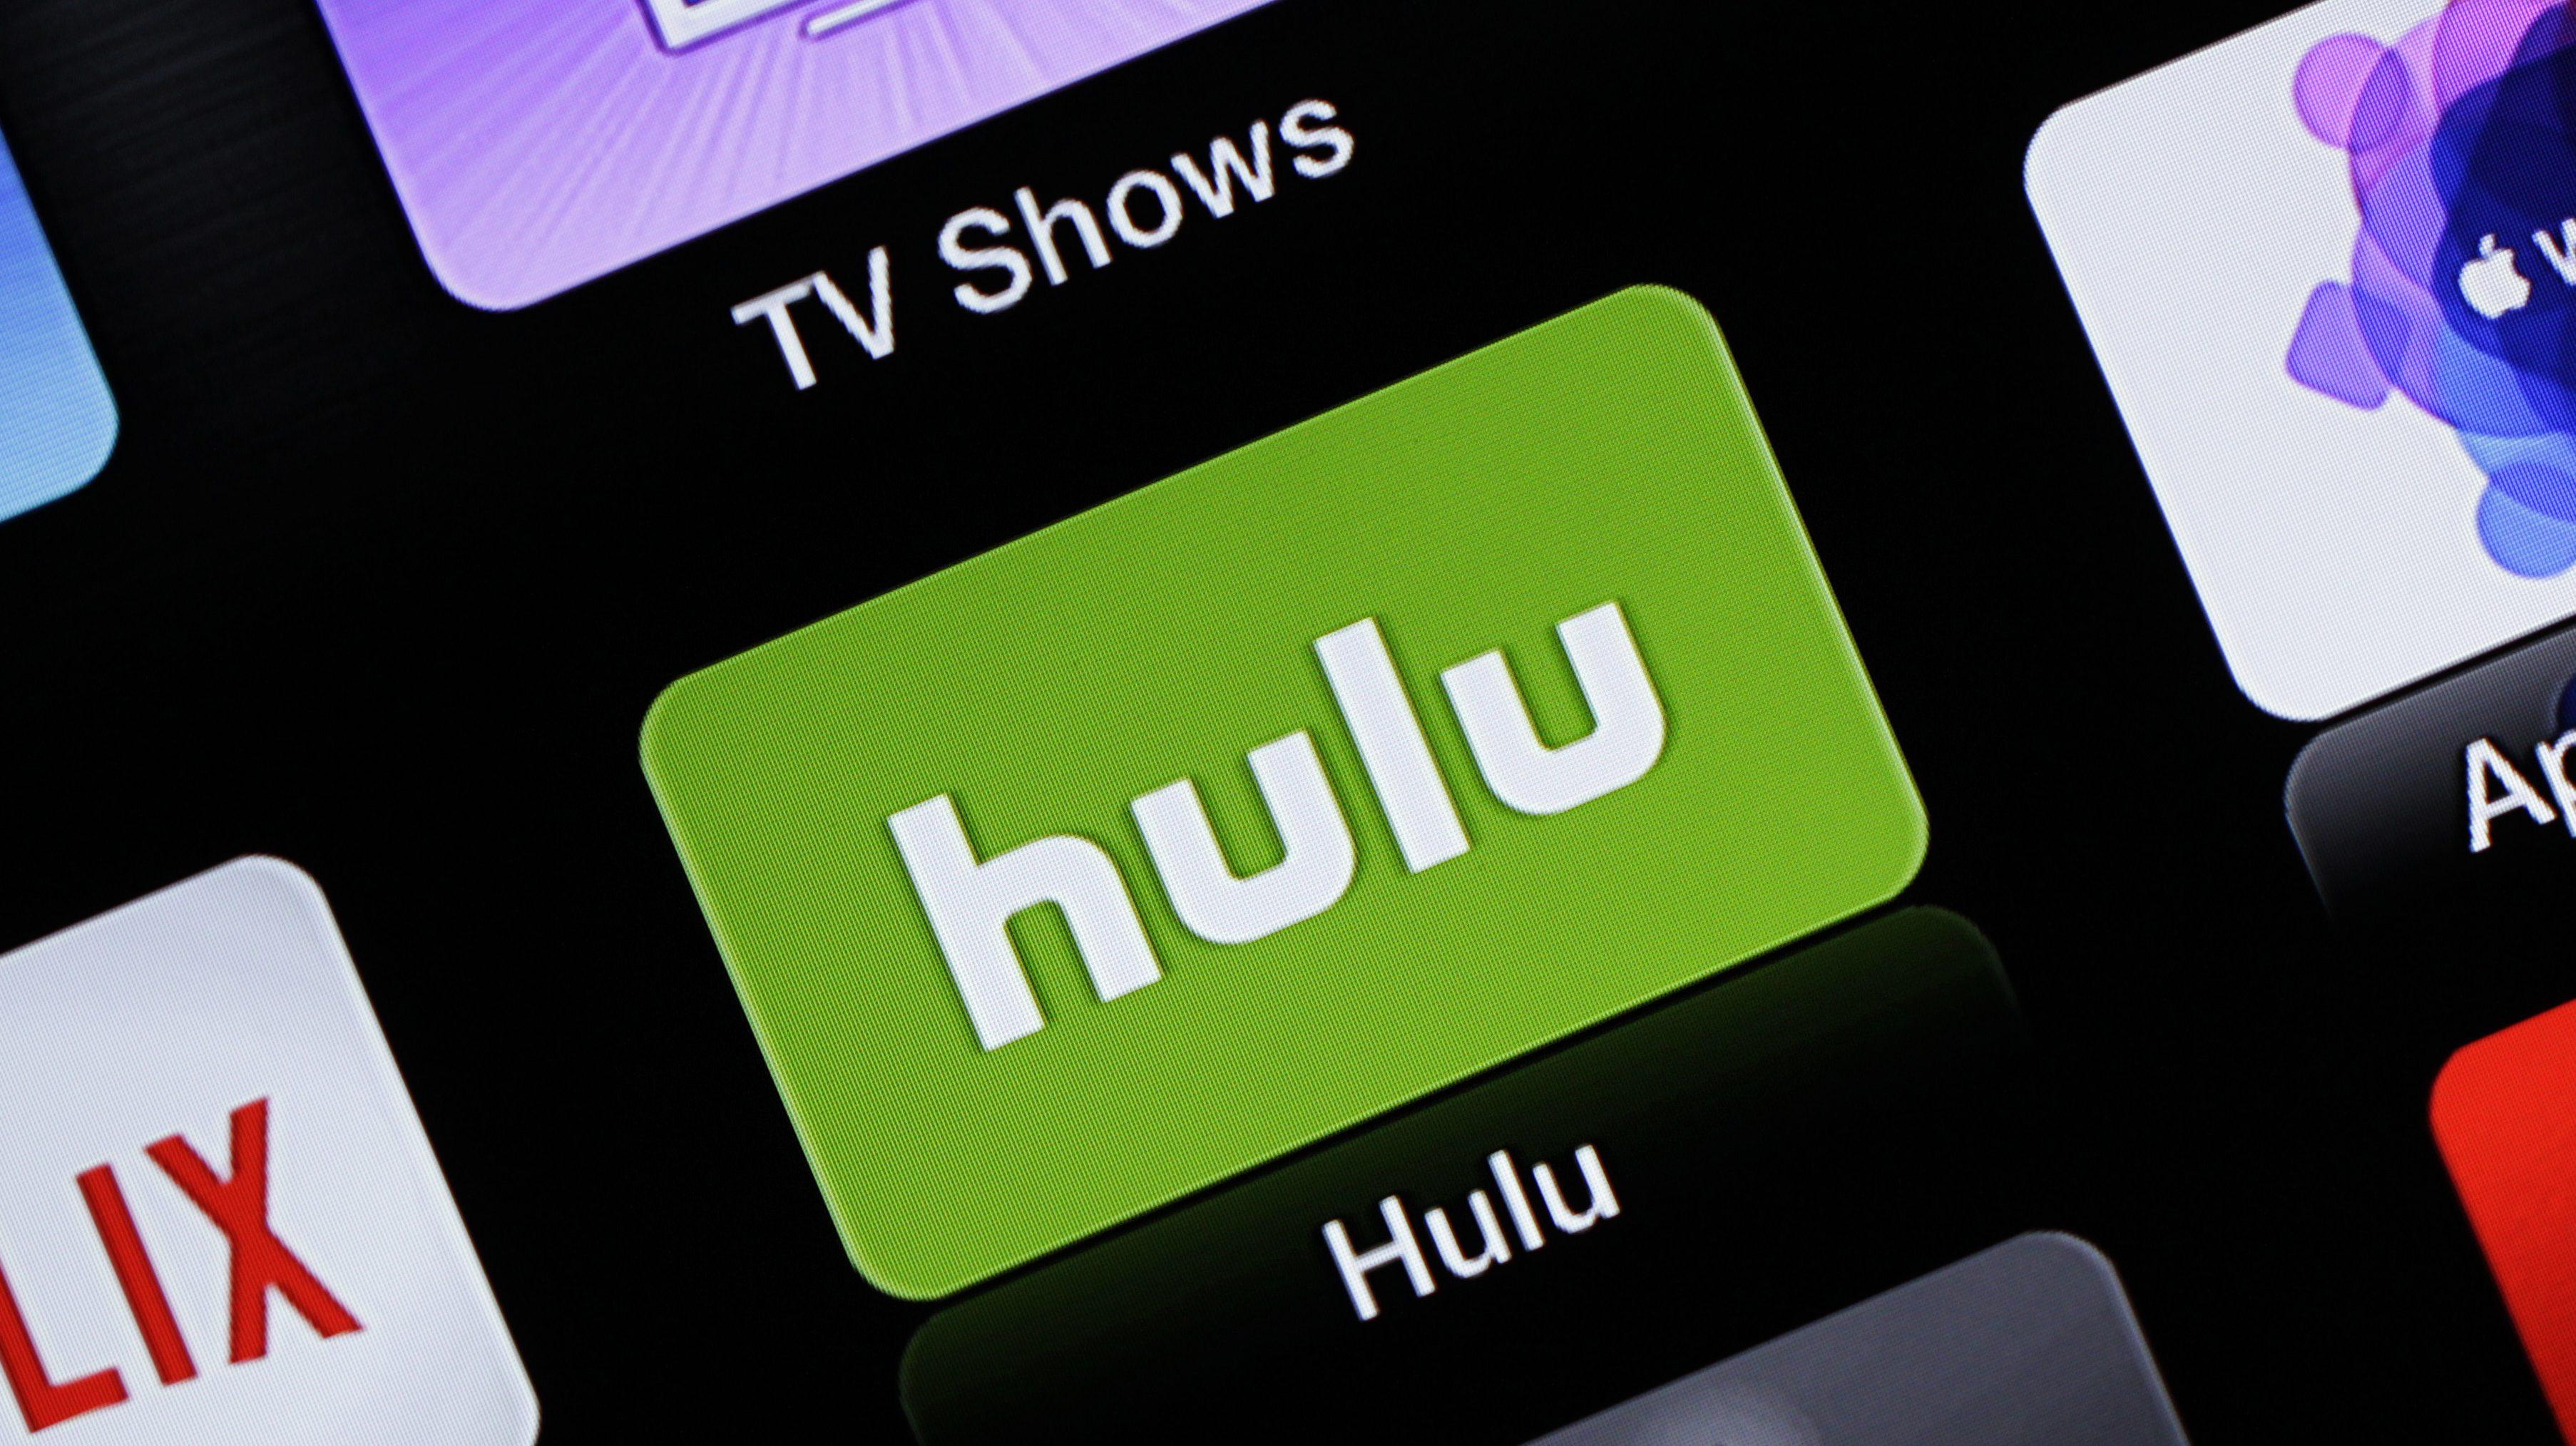 This June 24, 2015 photo shows the Hulu Apple TV app icon, in South Orange, N.J.  (AP Photo/Dan Goodman)